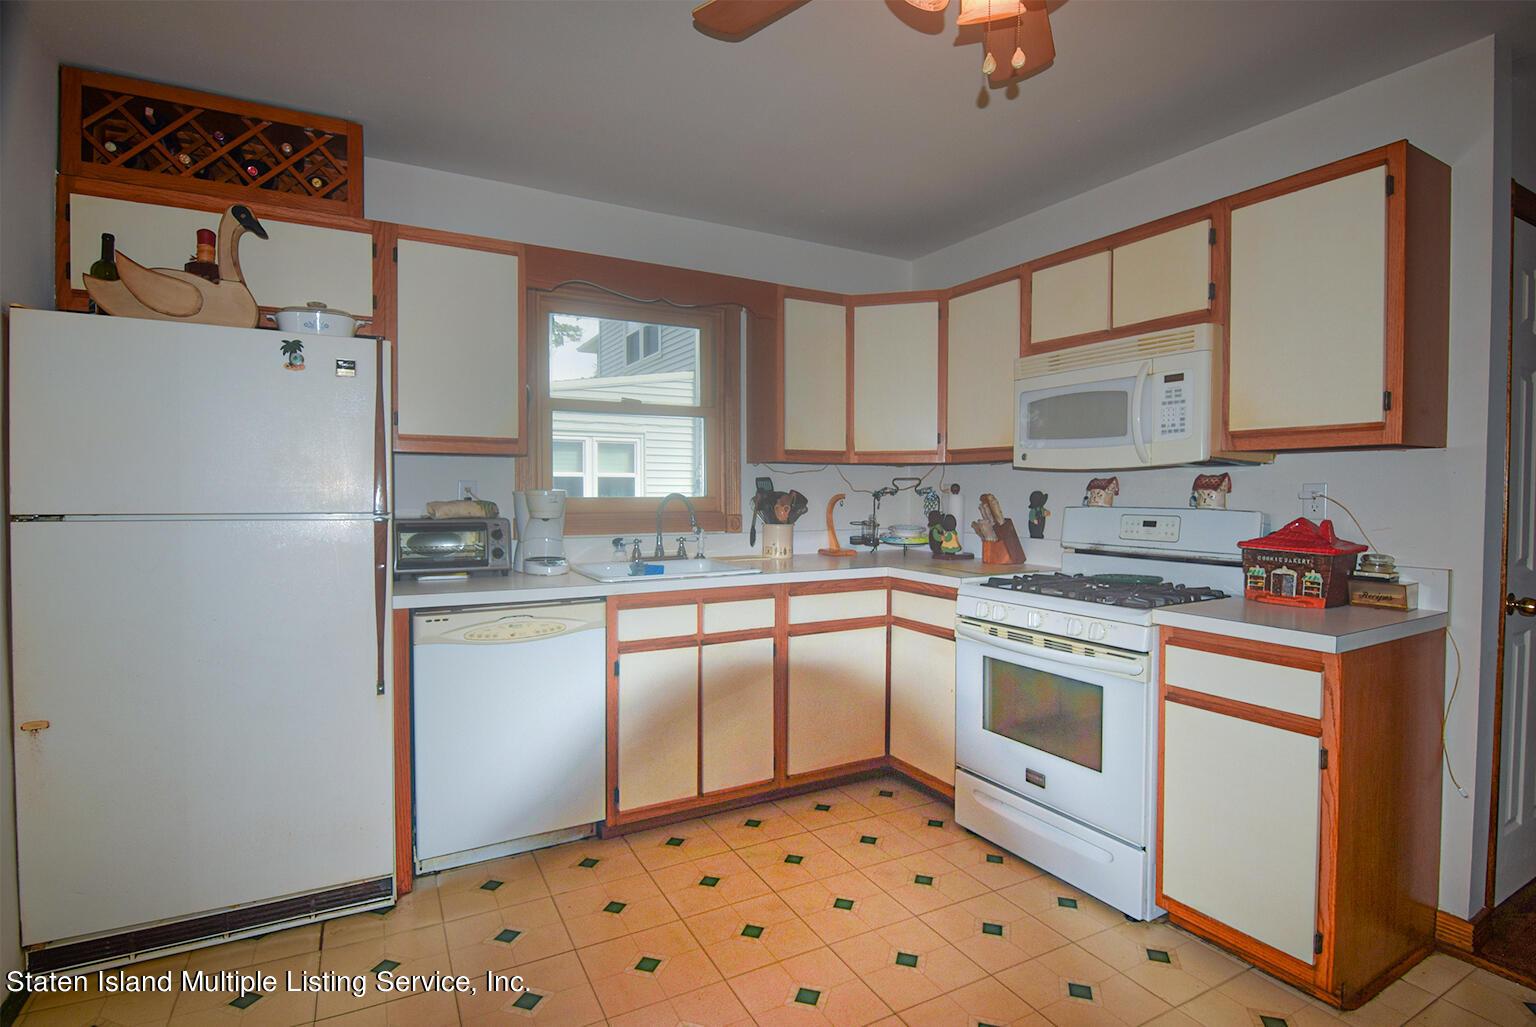 Single Family - Semi-Attached 524 Tennyson Drive  Staten Island, NY 10312, MLS-1149452-6